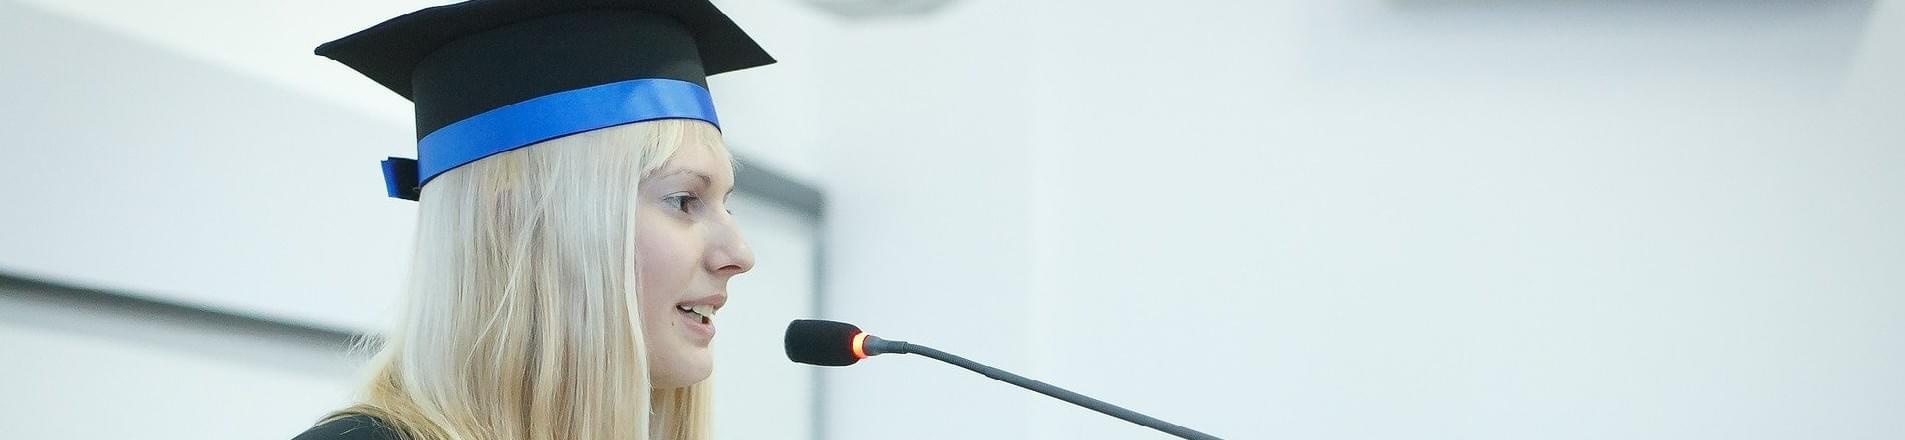 Graduate vacancies set to have boost but 'tensions persist'